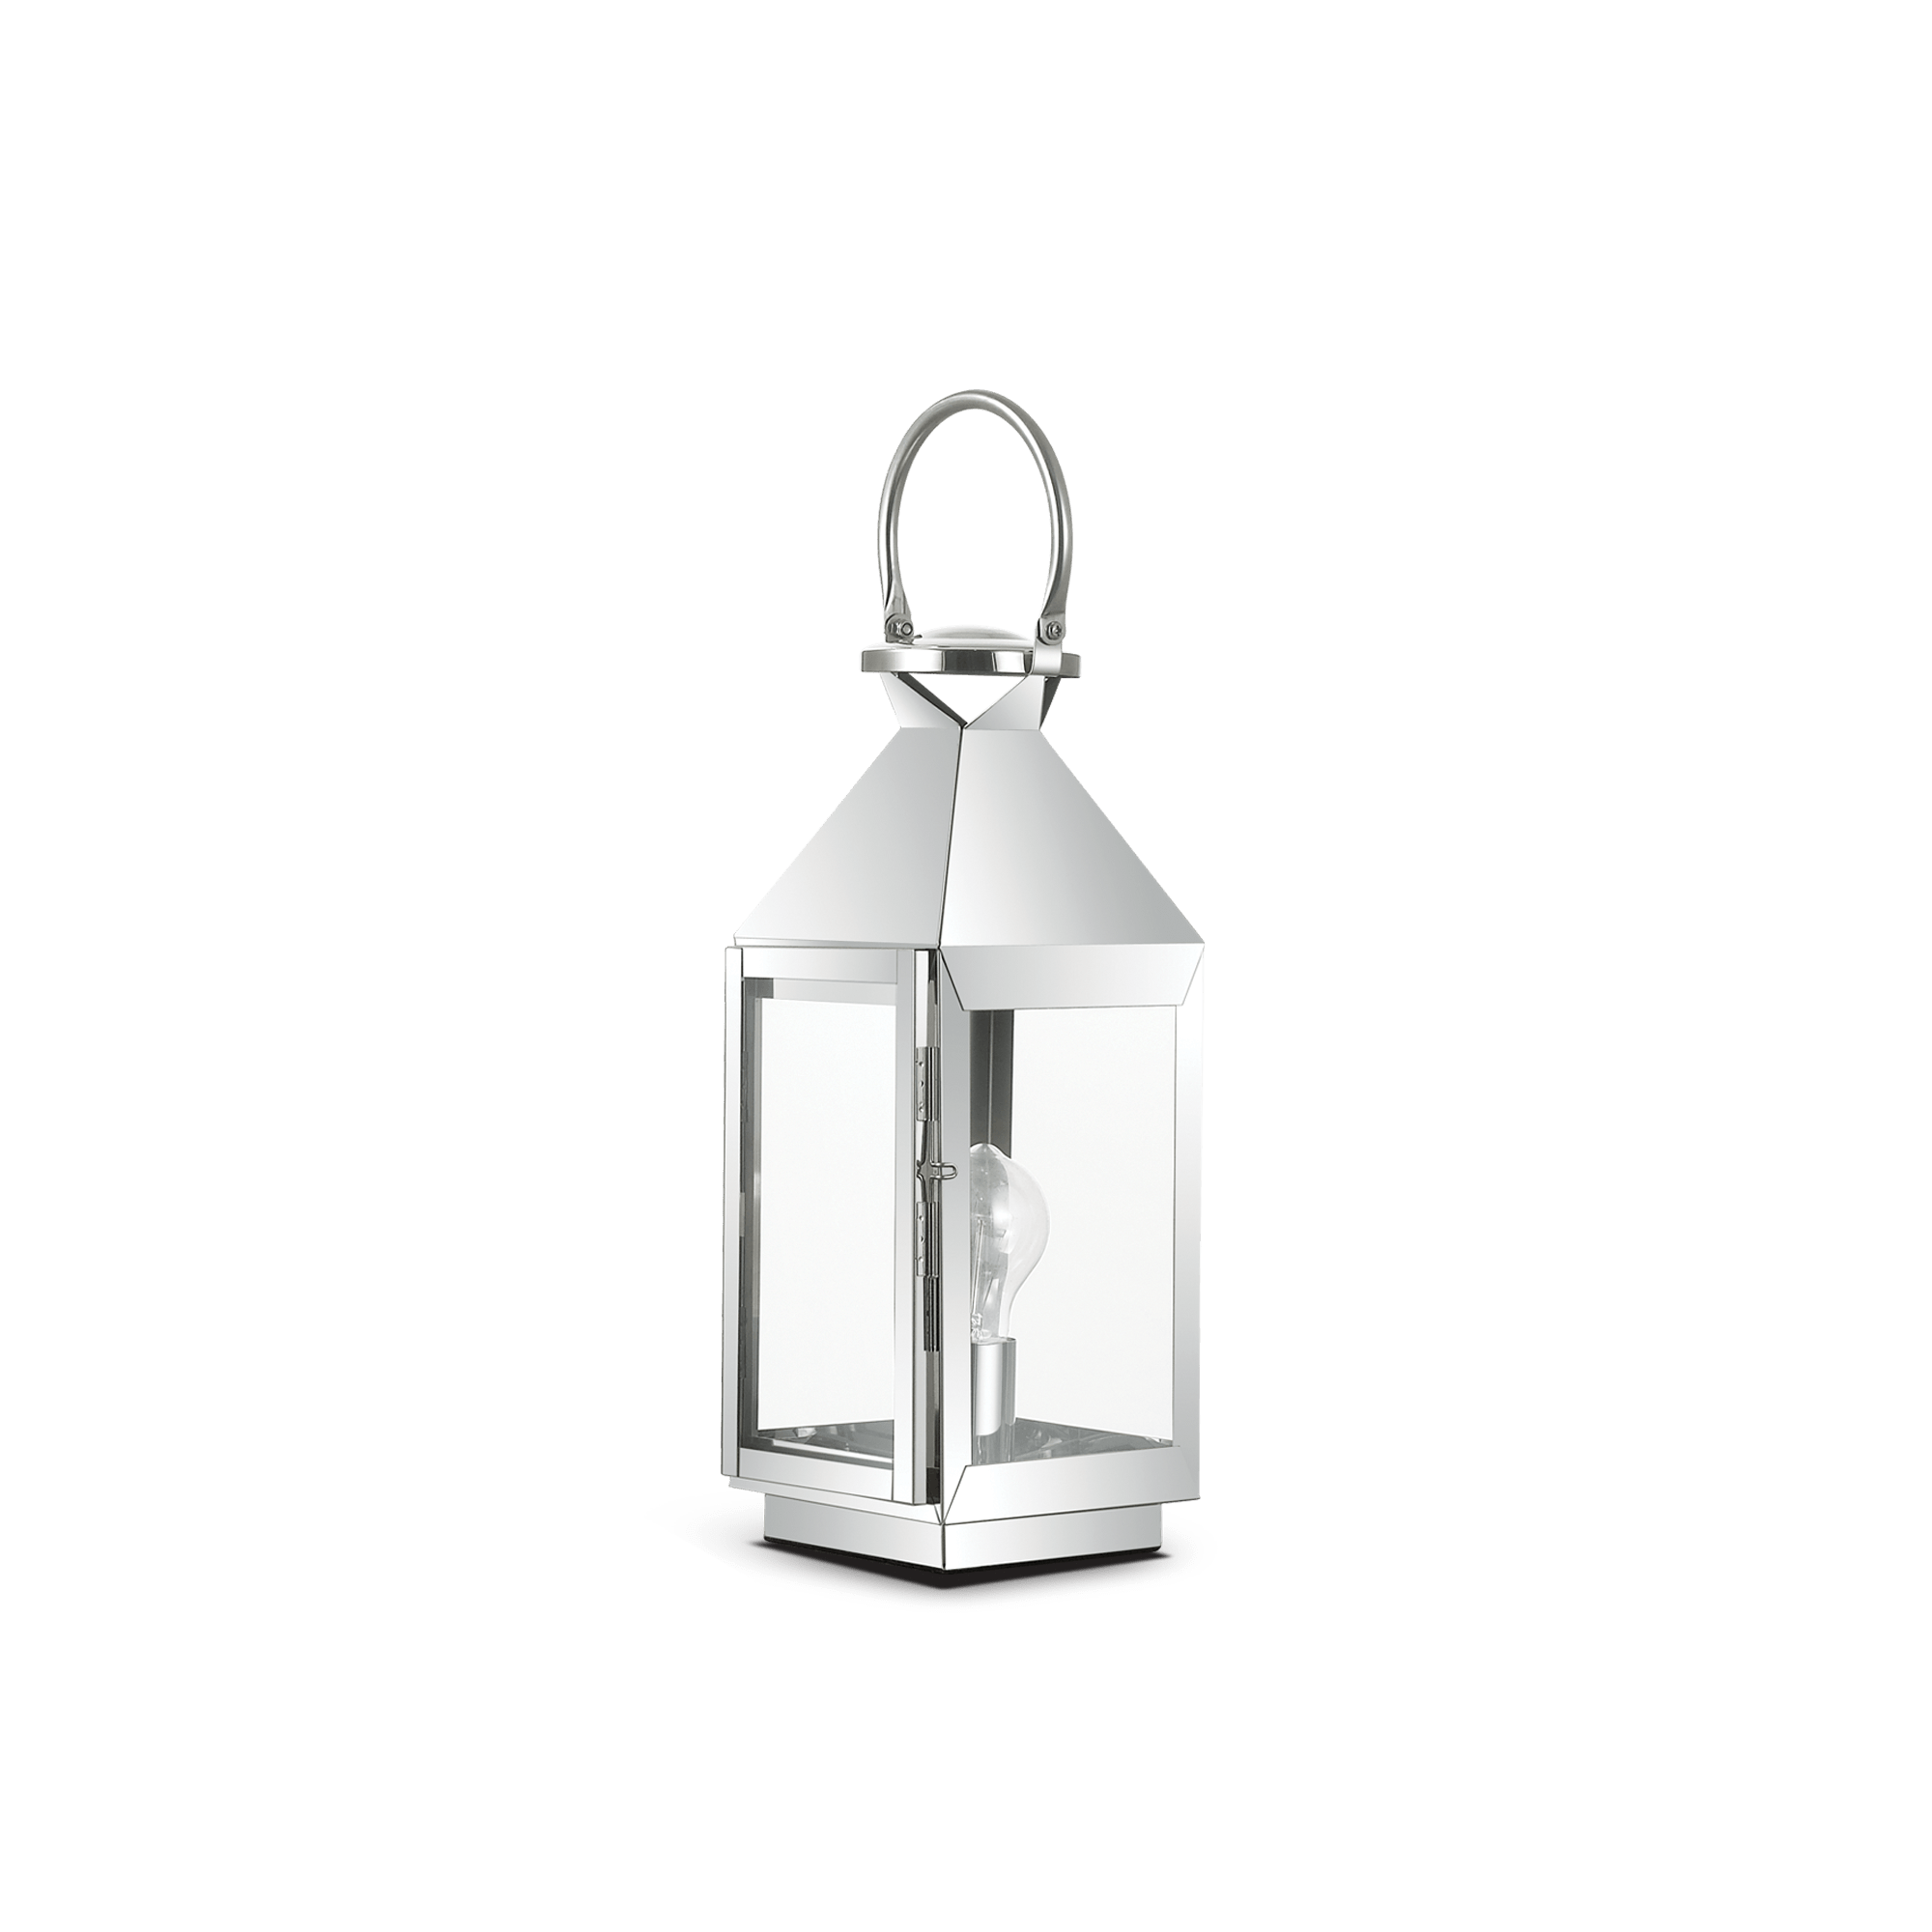 Ideal Lux 166650 MERMAID TL1 SMALL CROMO asztali lámpa